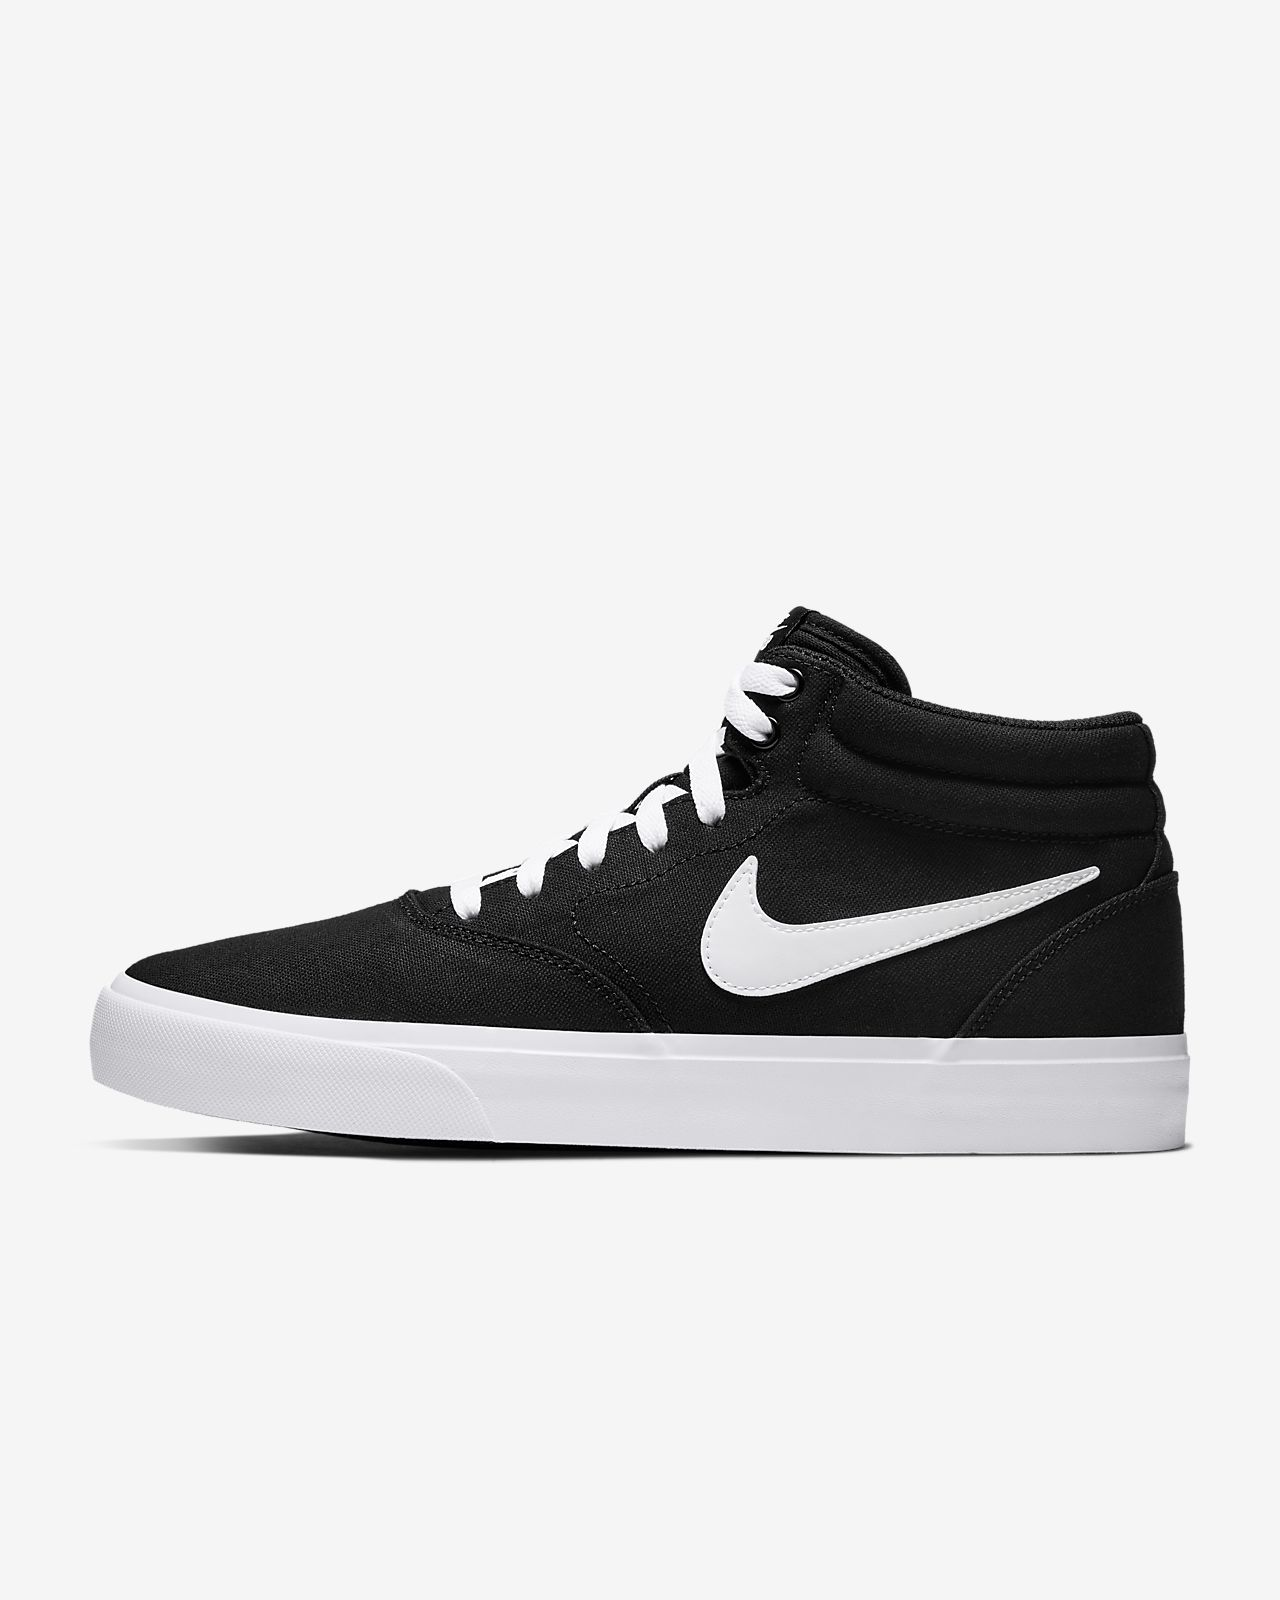 Neueste Nike Schuhe Sale: Nike SB Blazer Mid Skateboarding